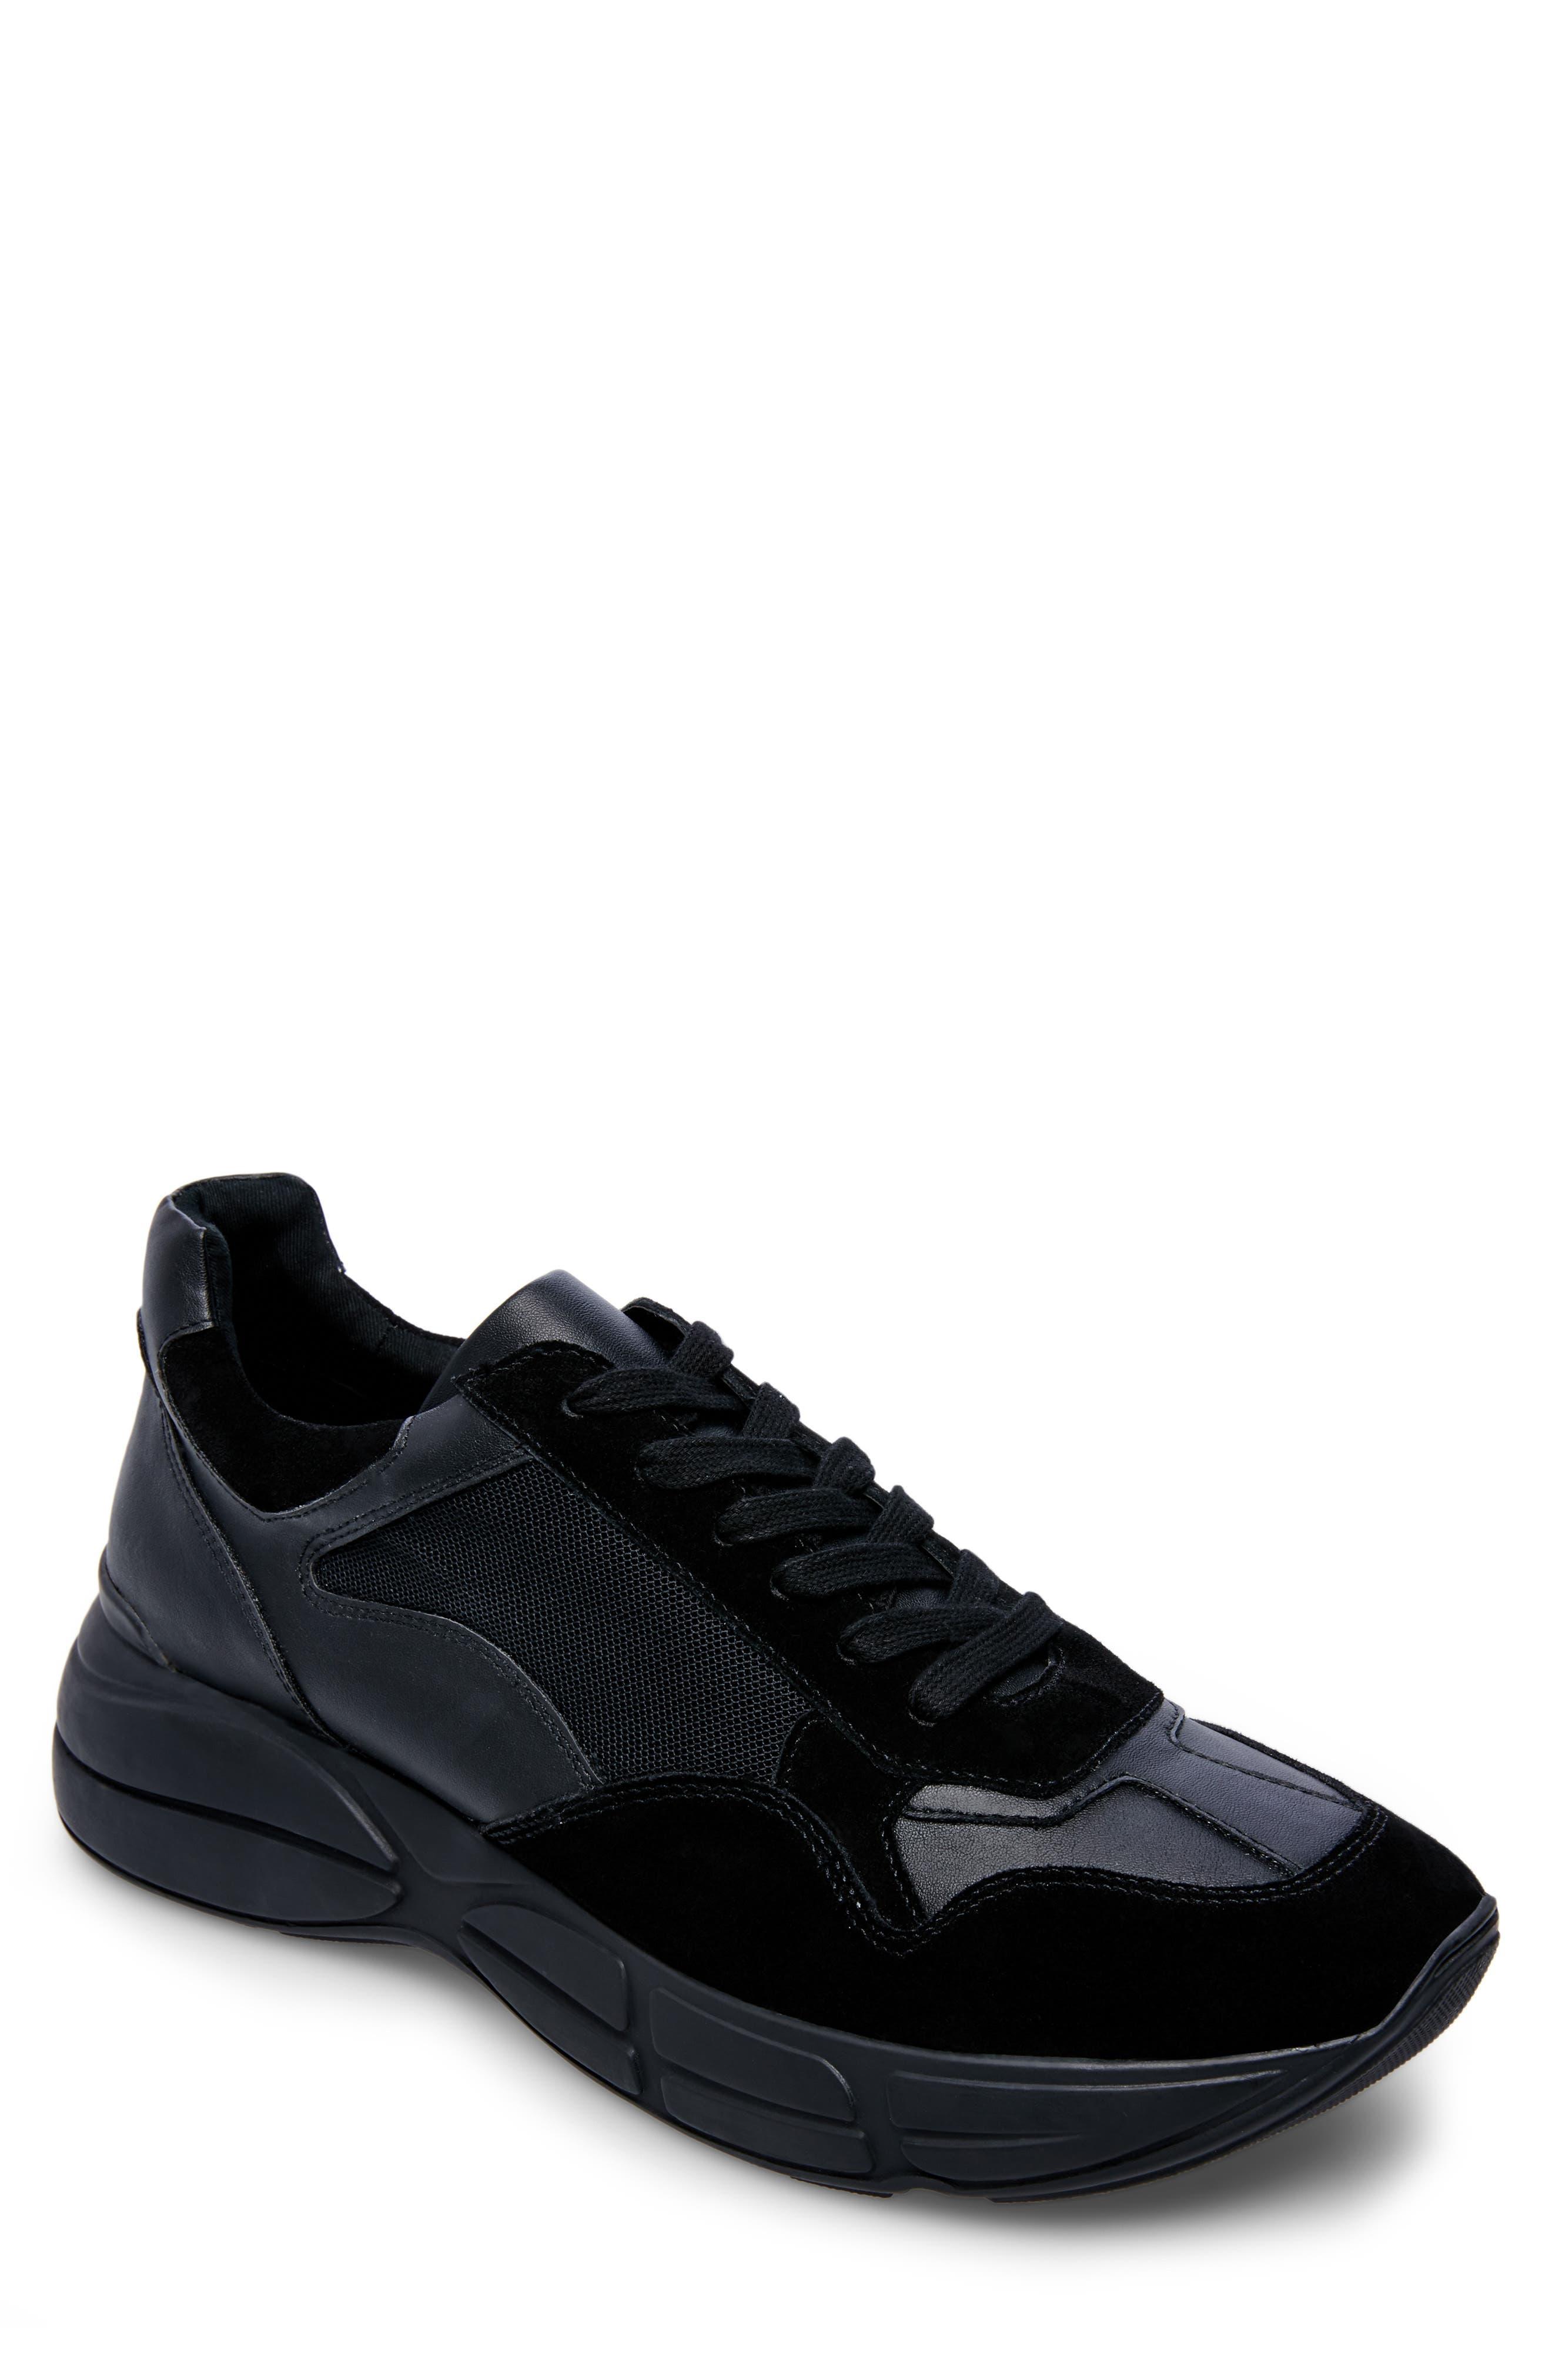 Cole Sneaker,                             Main thumbnail 1, color,                             002